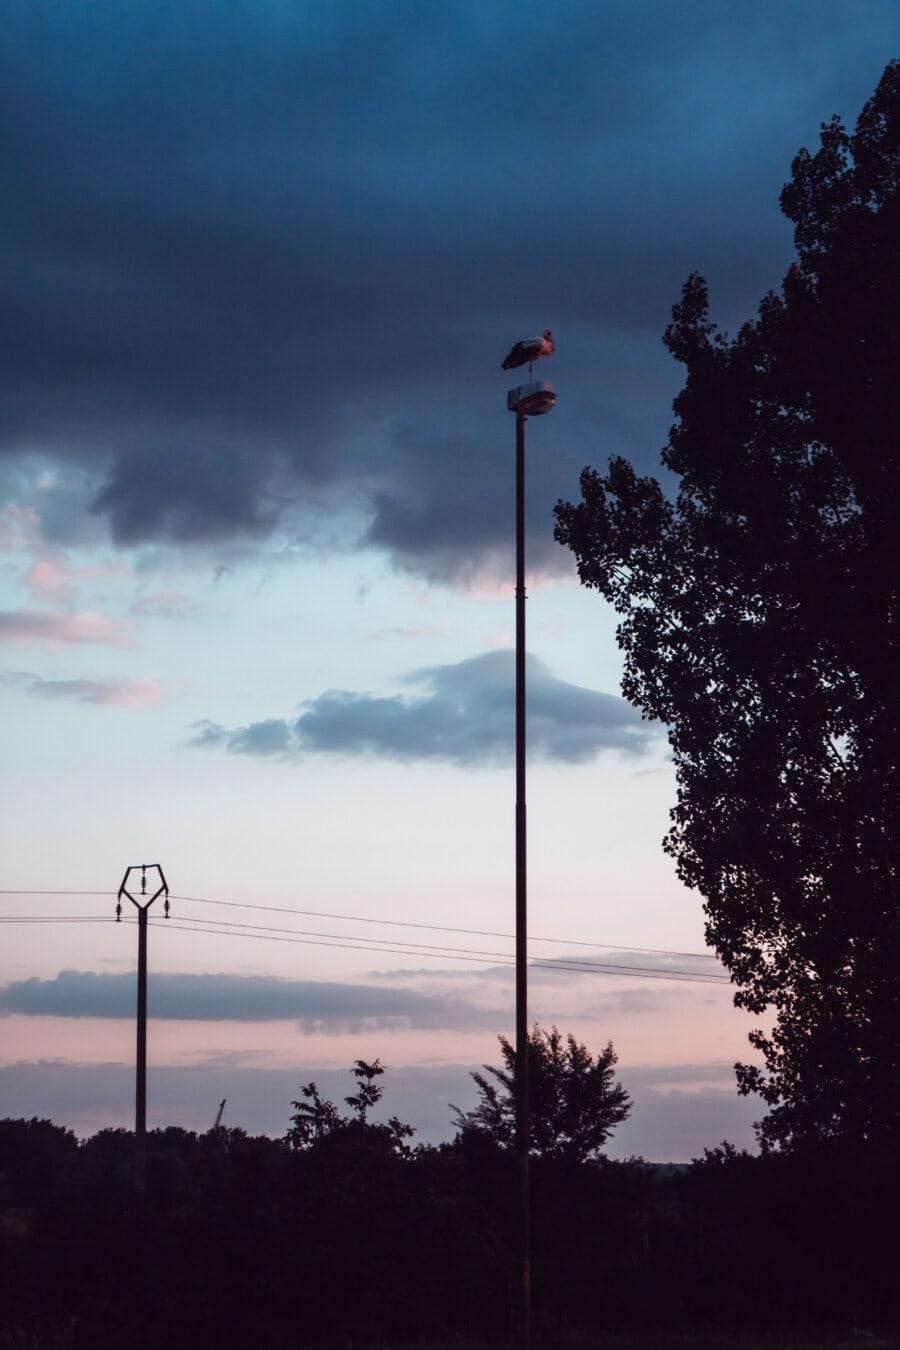 bird, standing, pole, dusk, blue sky, silhouette, sunset, light, landscape, tree